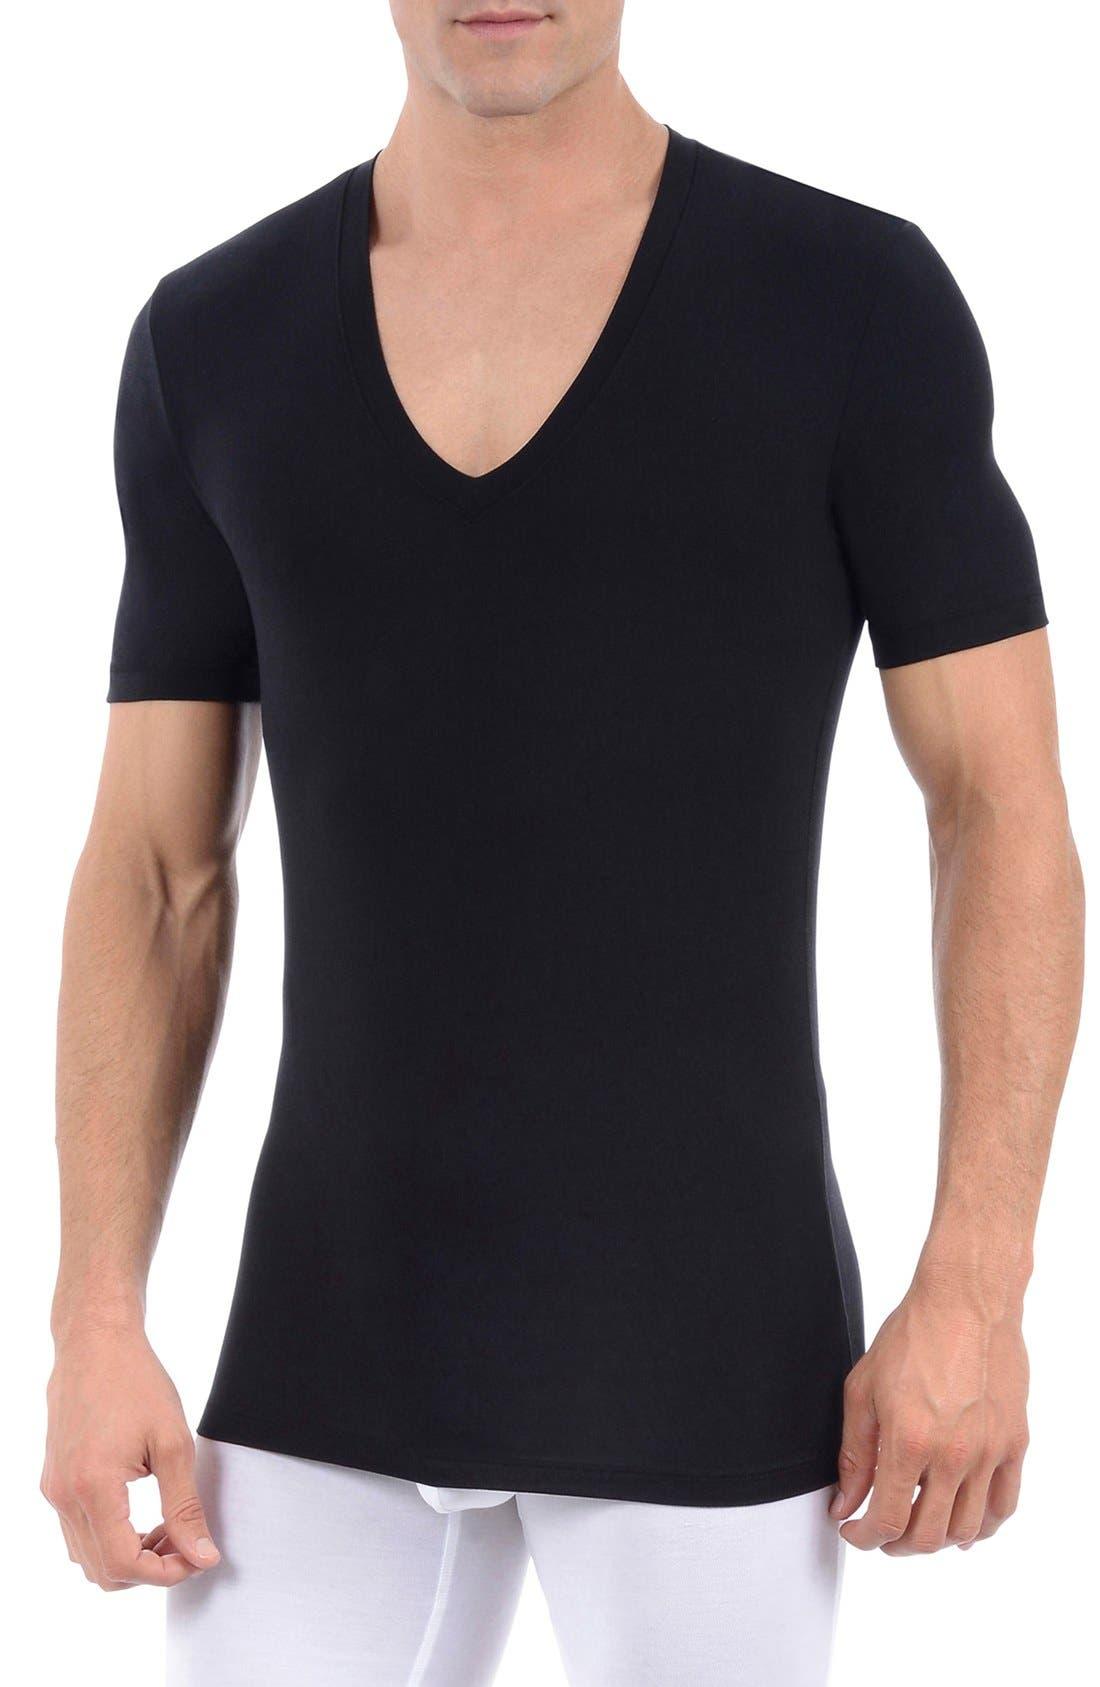 Alternate Image 1 Selected - Tommy John 'Second Skin' Deep V-Neck Undershirt